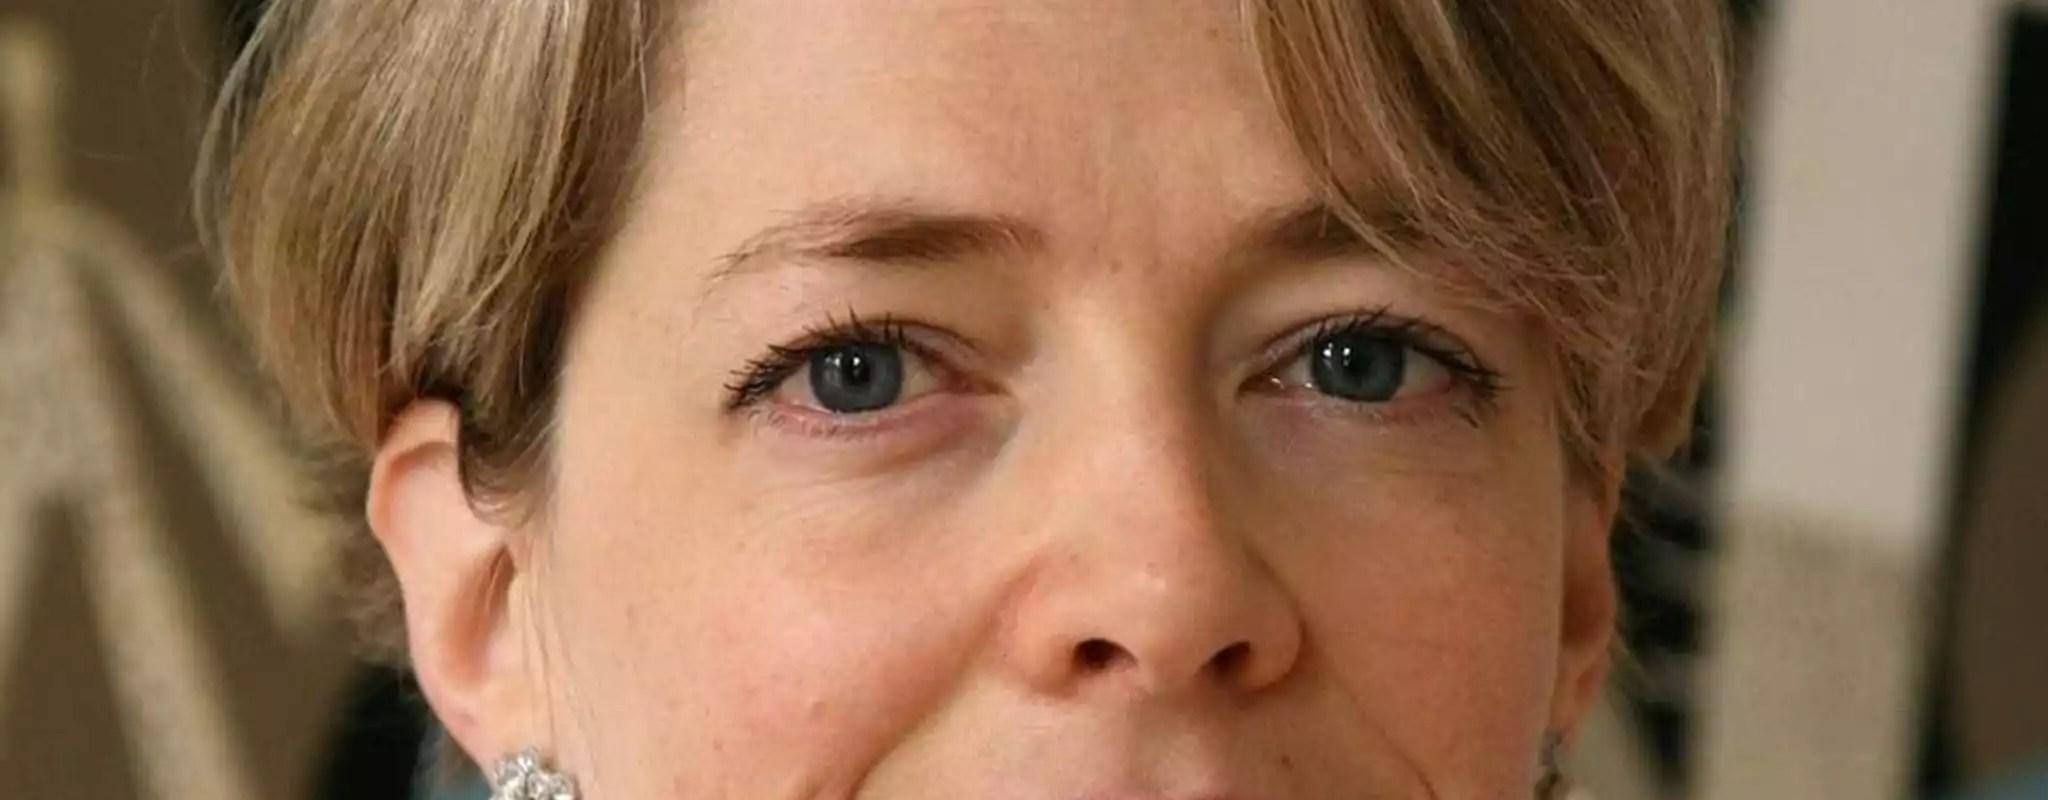 Christina Kruger élue bâtonnier de l'ordre des avocats de Strasbourg